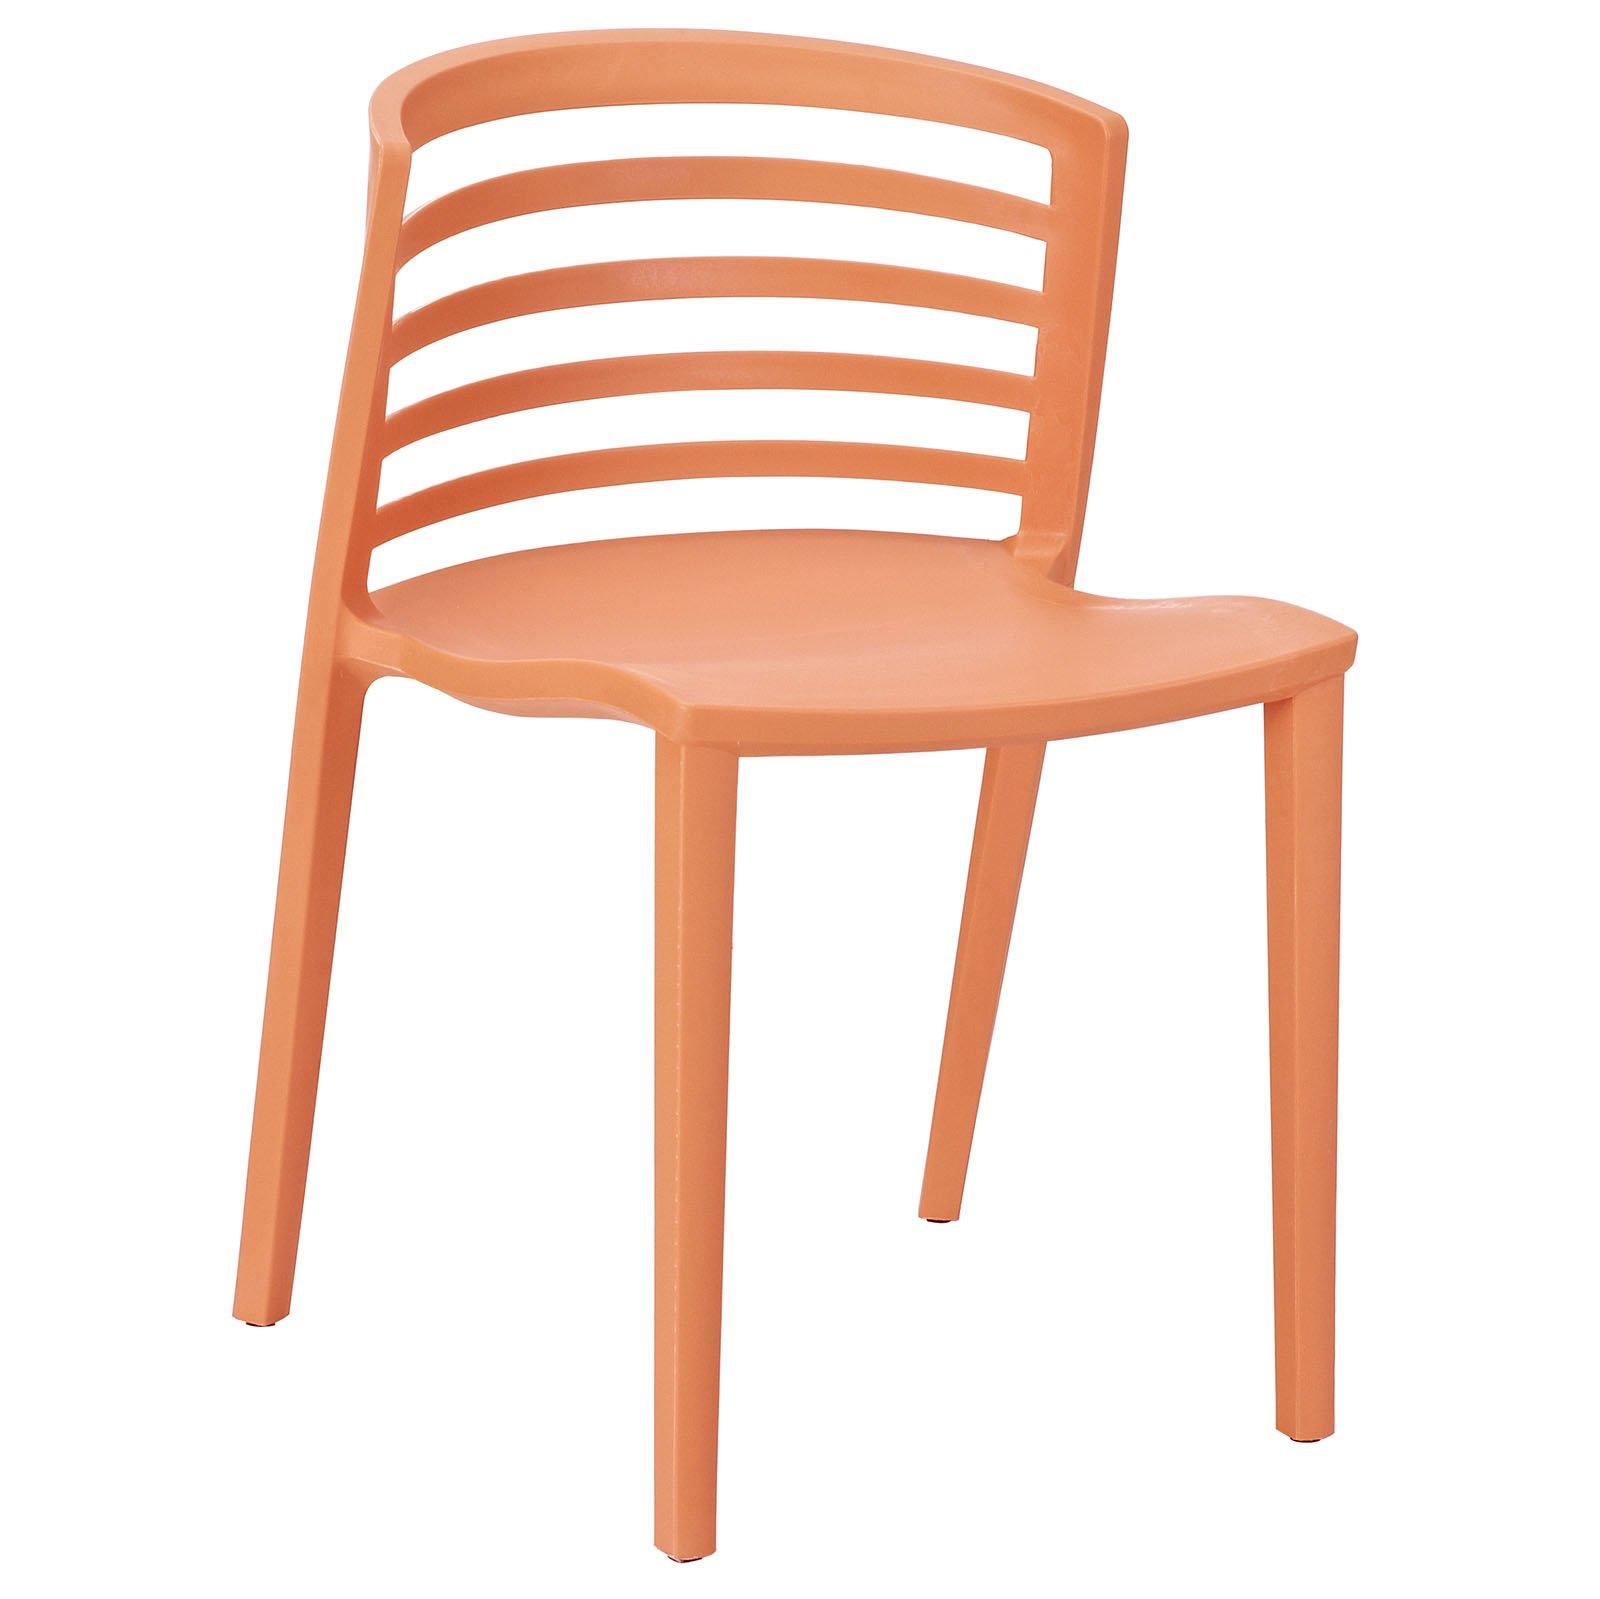 Modway Curvy Plastic Chair, Orange